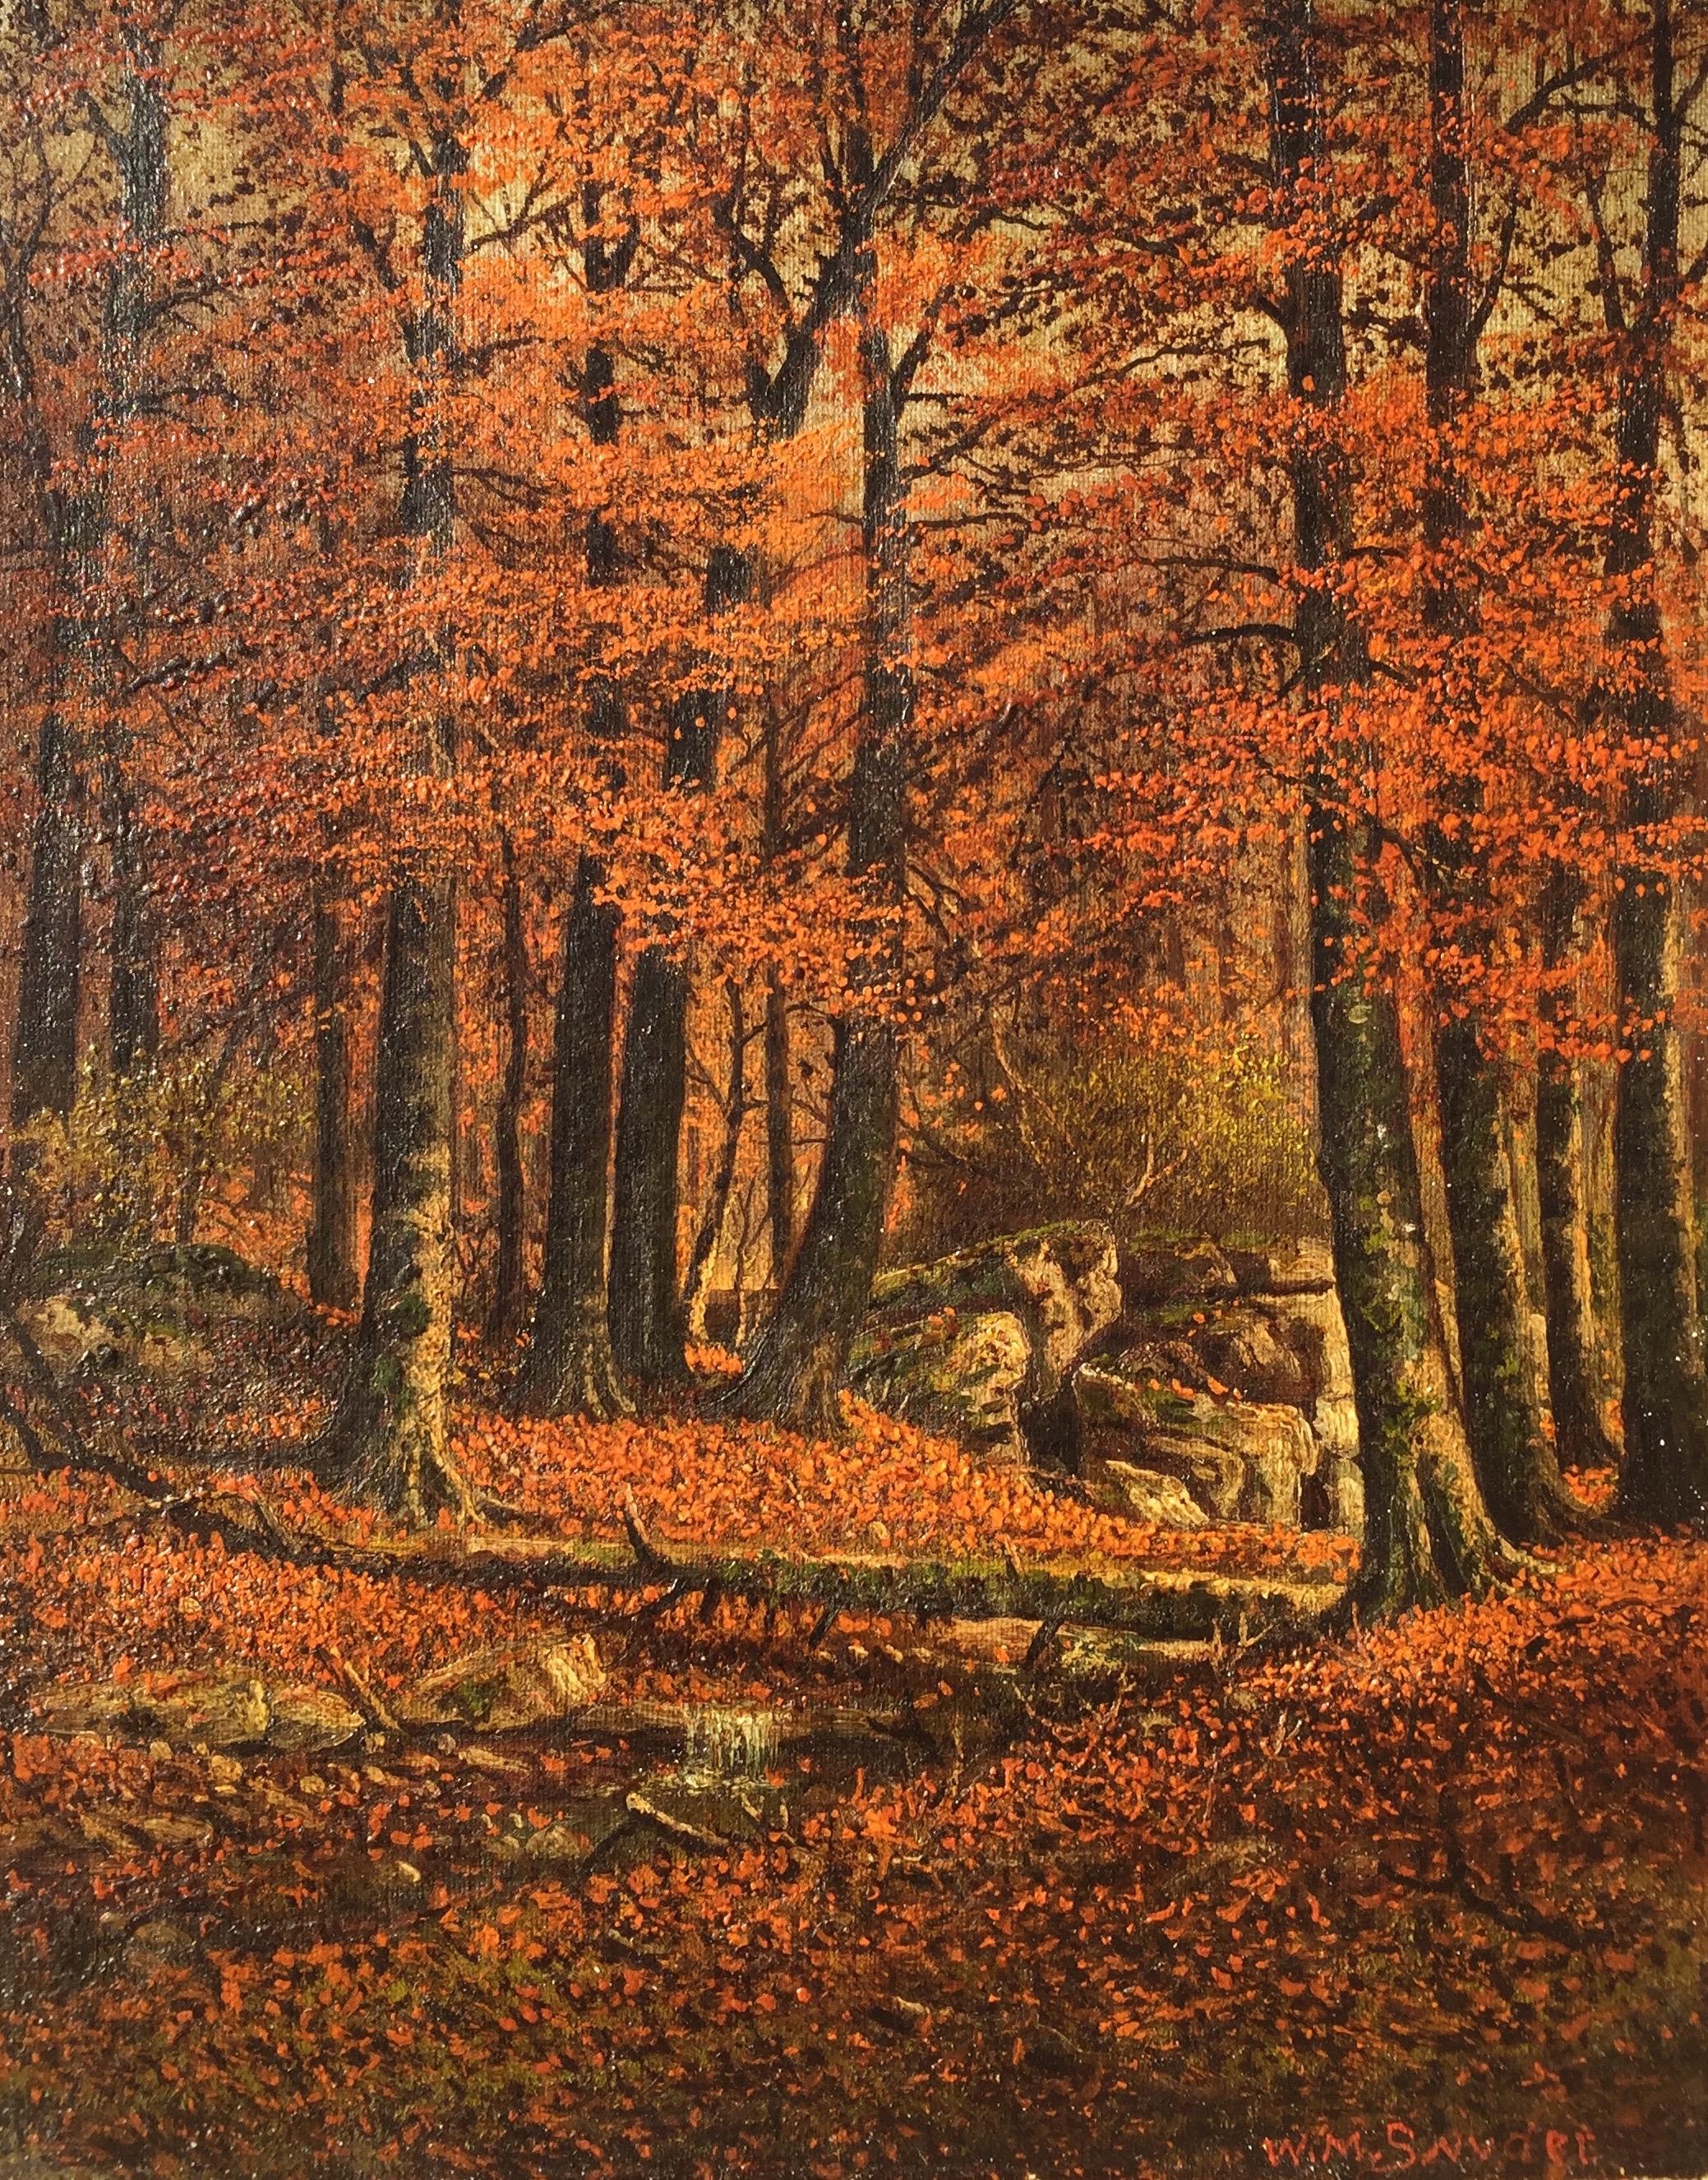 snyder-thestreamintheautumnwoods